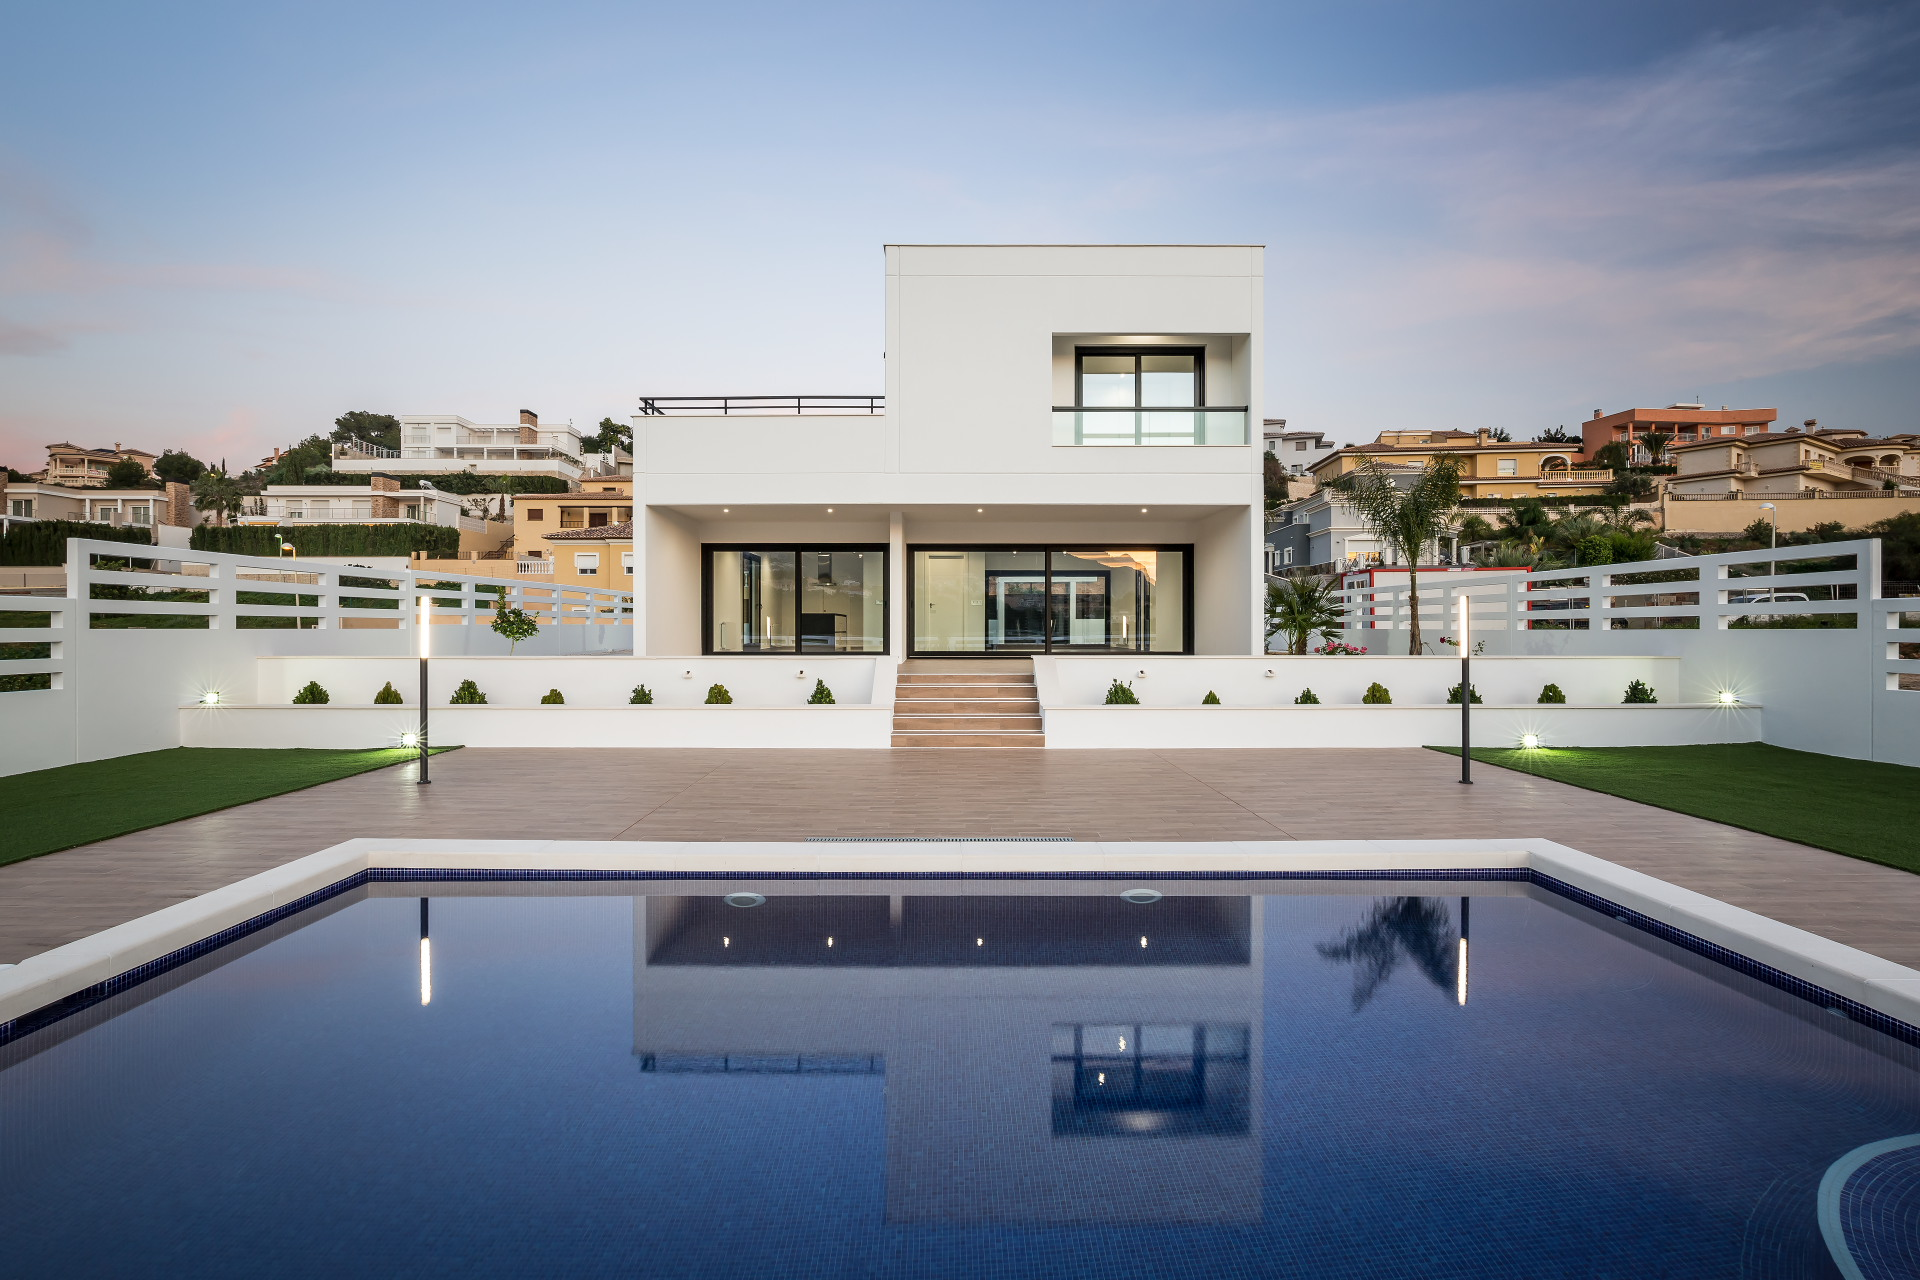 fotografia-arquitectura-valencia-german-cabo-viraje-vivienda-unifamiliar-calpe (42)